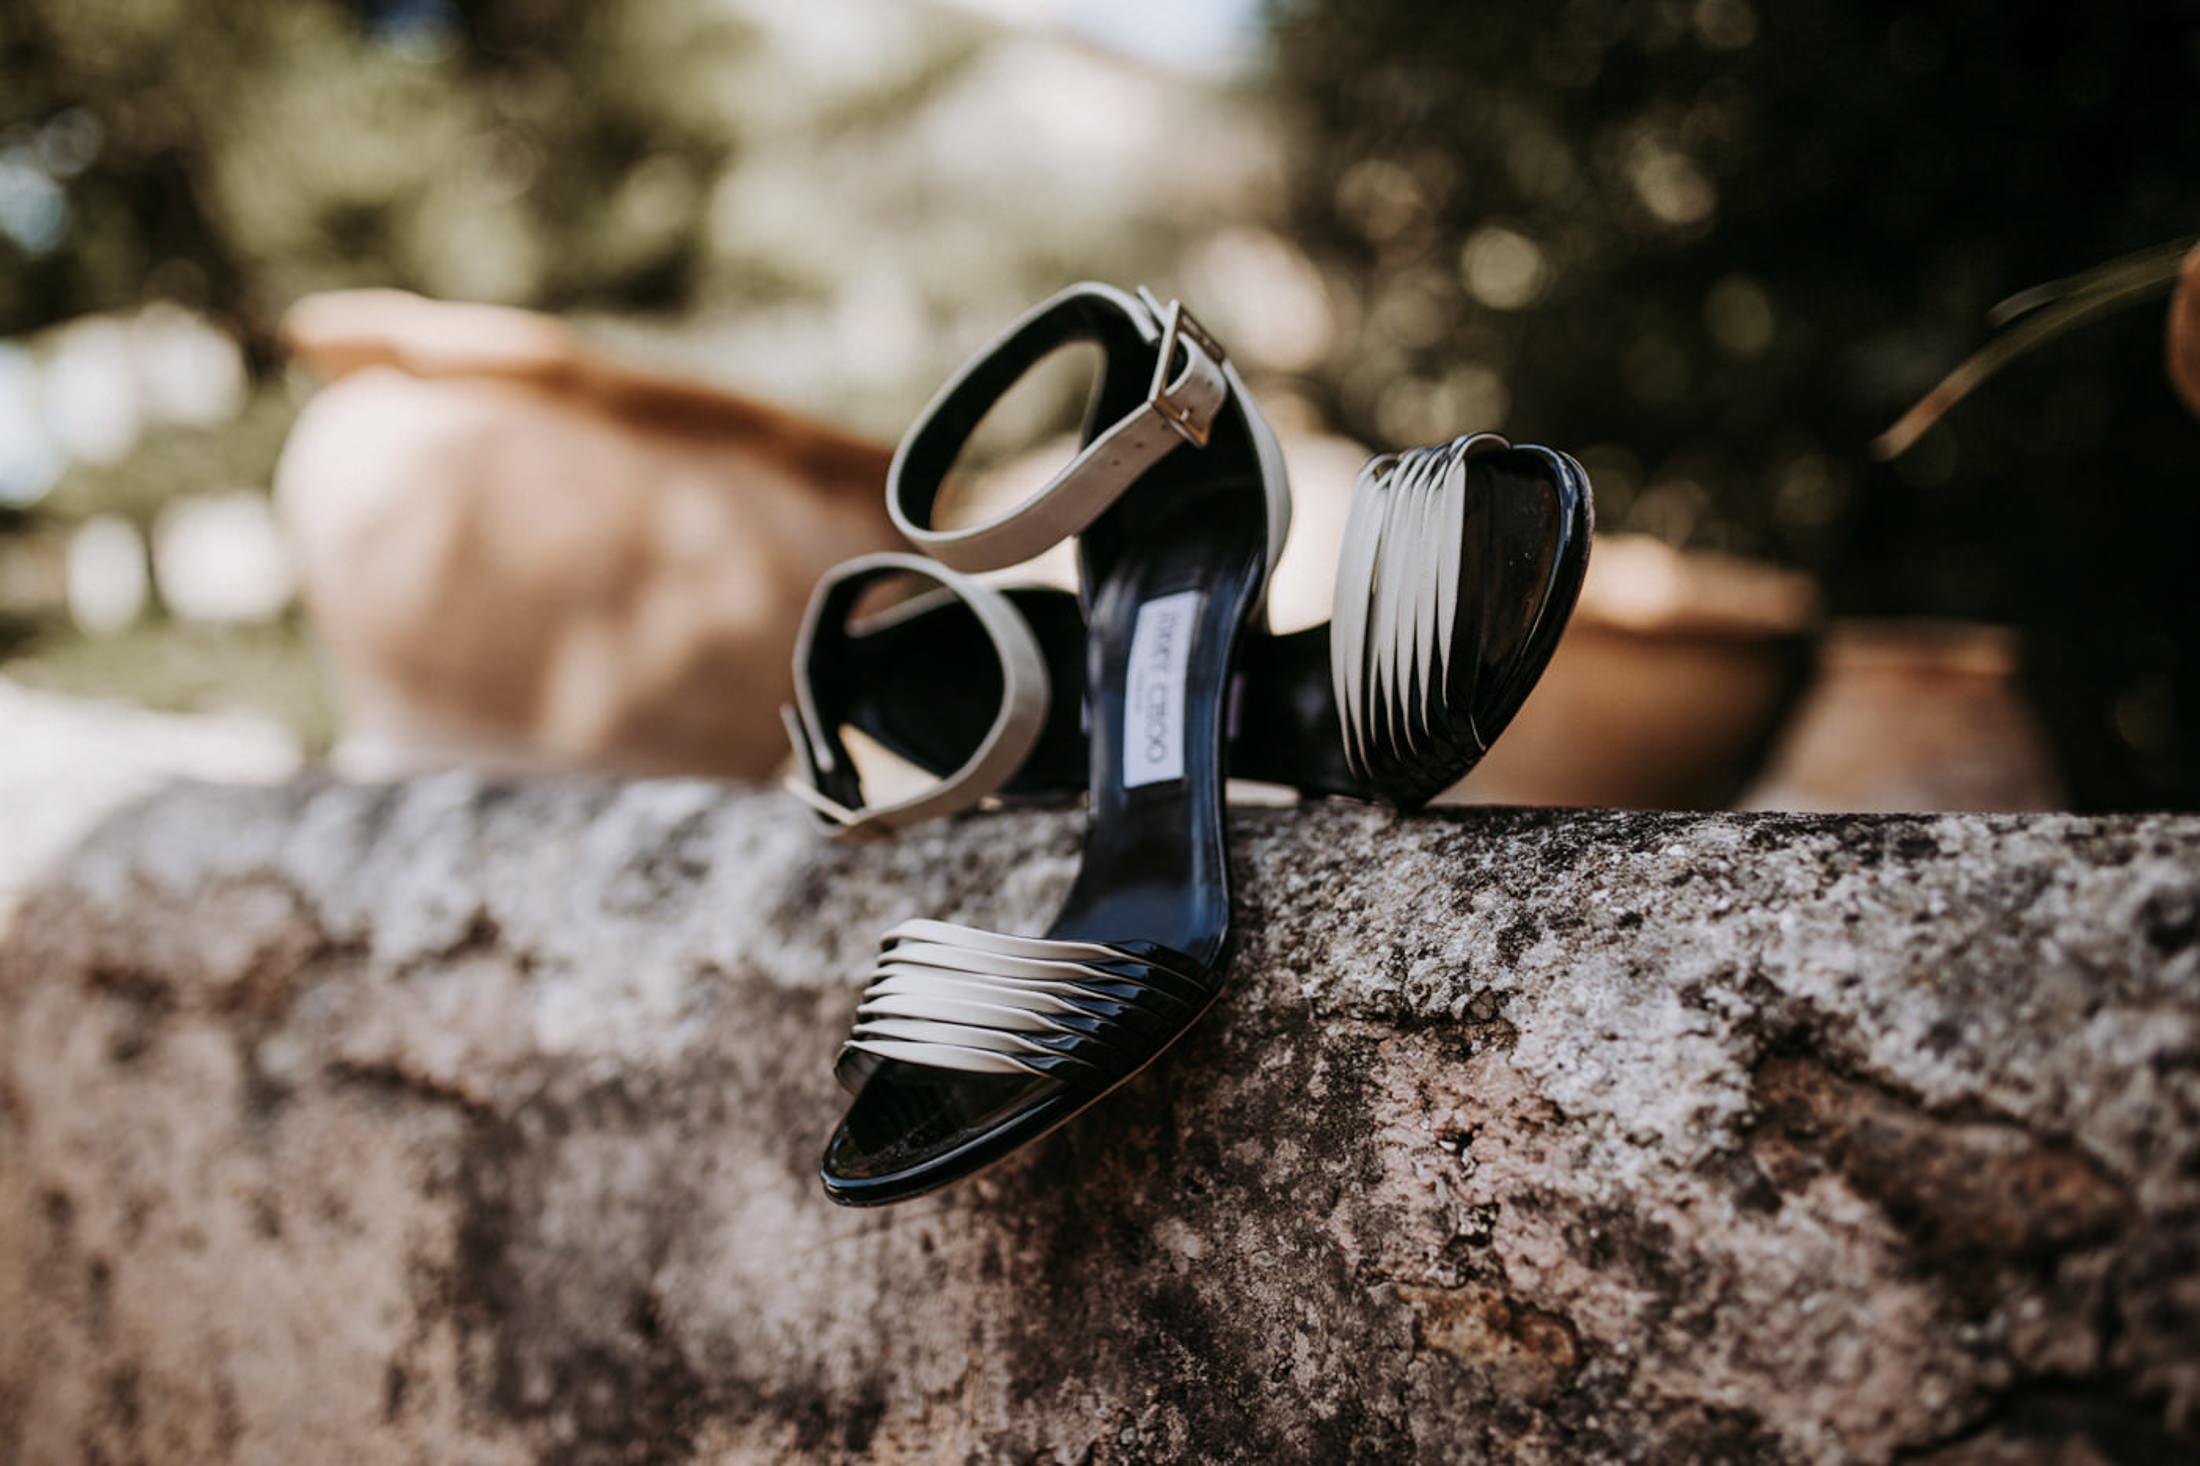 Wedding_Photographer_Mallorca_Daniela-Marquardt_Photography_New_York_Iceland_Tuscany_Santorini_Portugal_Austria_Bavaria_Elopement_Hochzeitsfotograf_AntjeRajat2_69